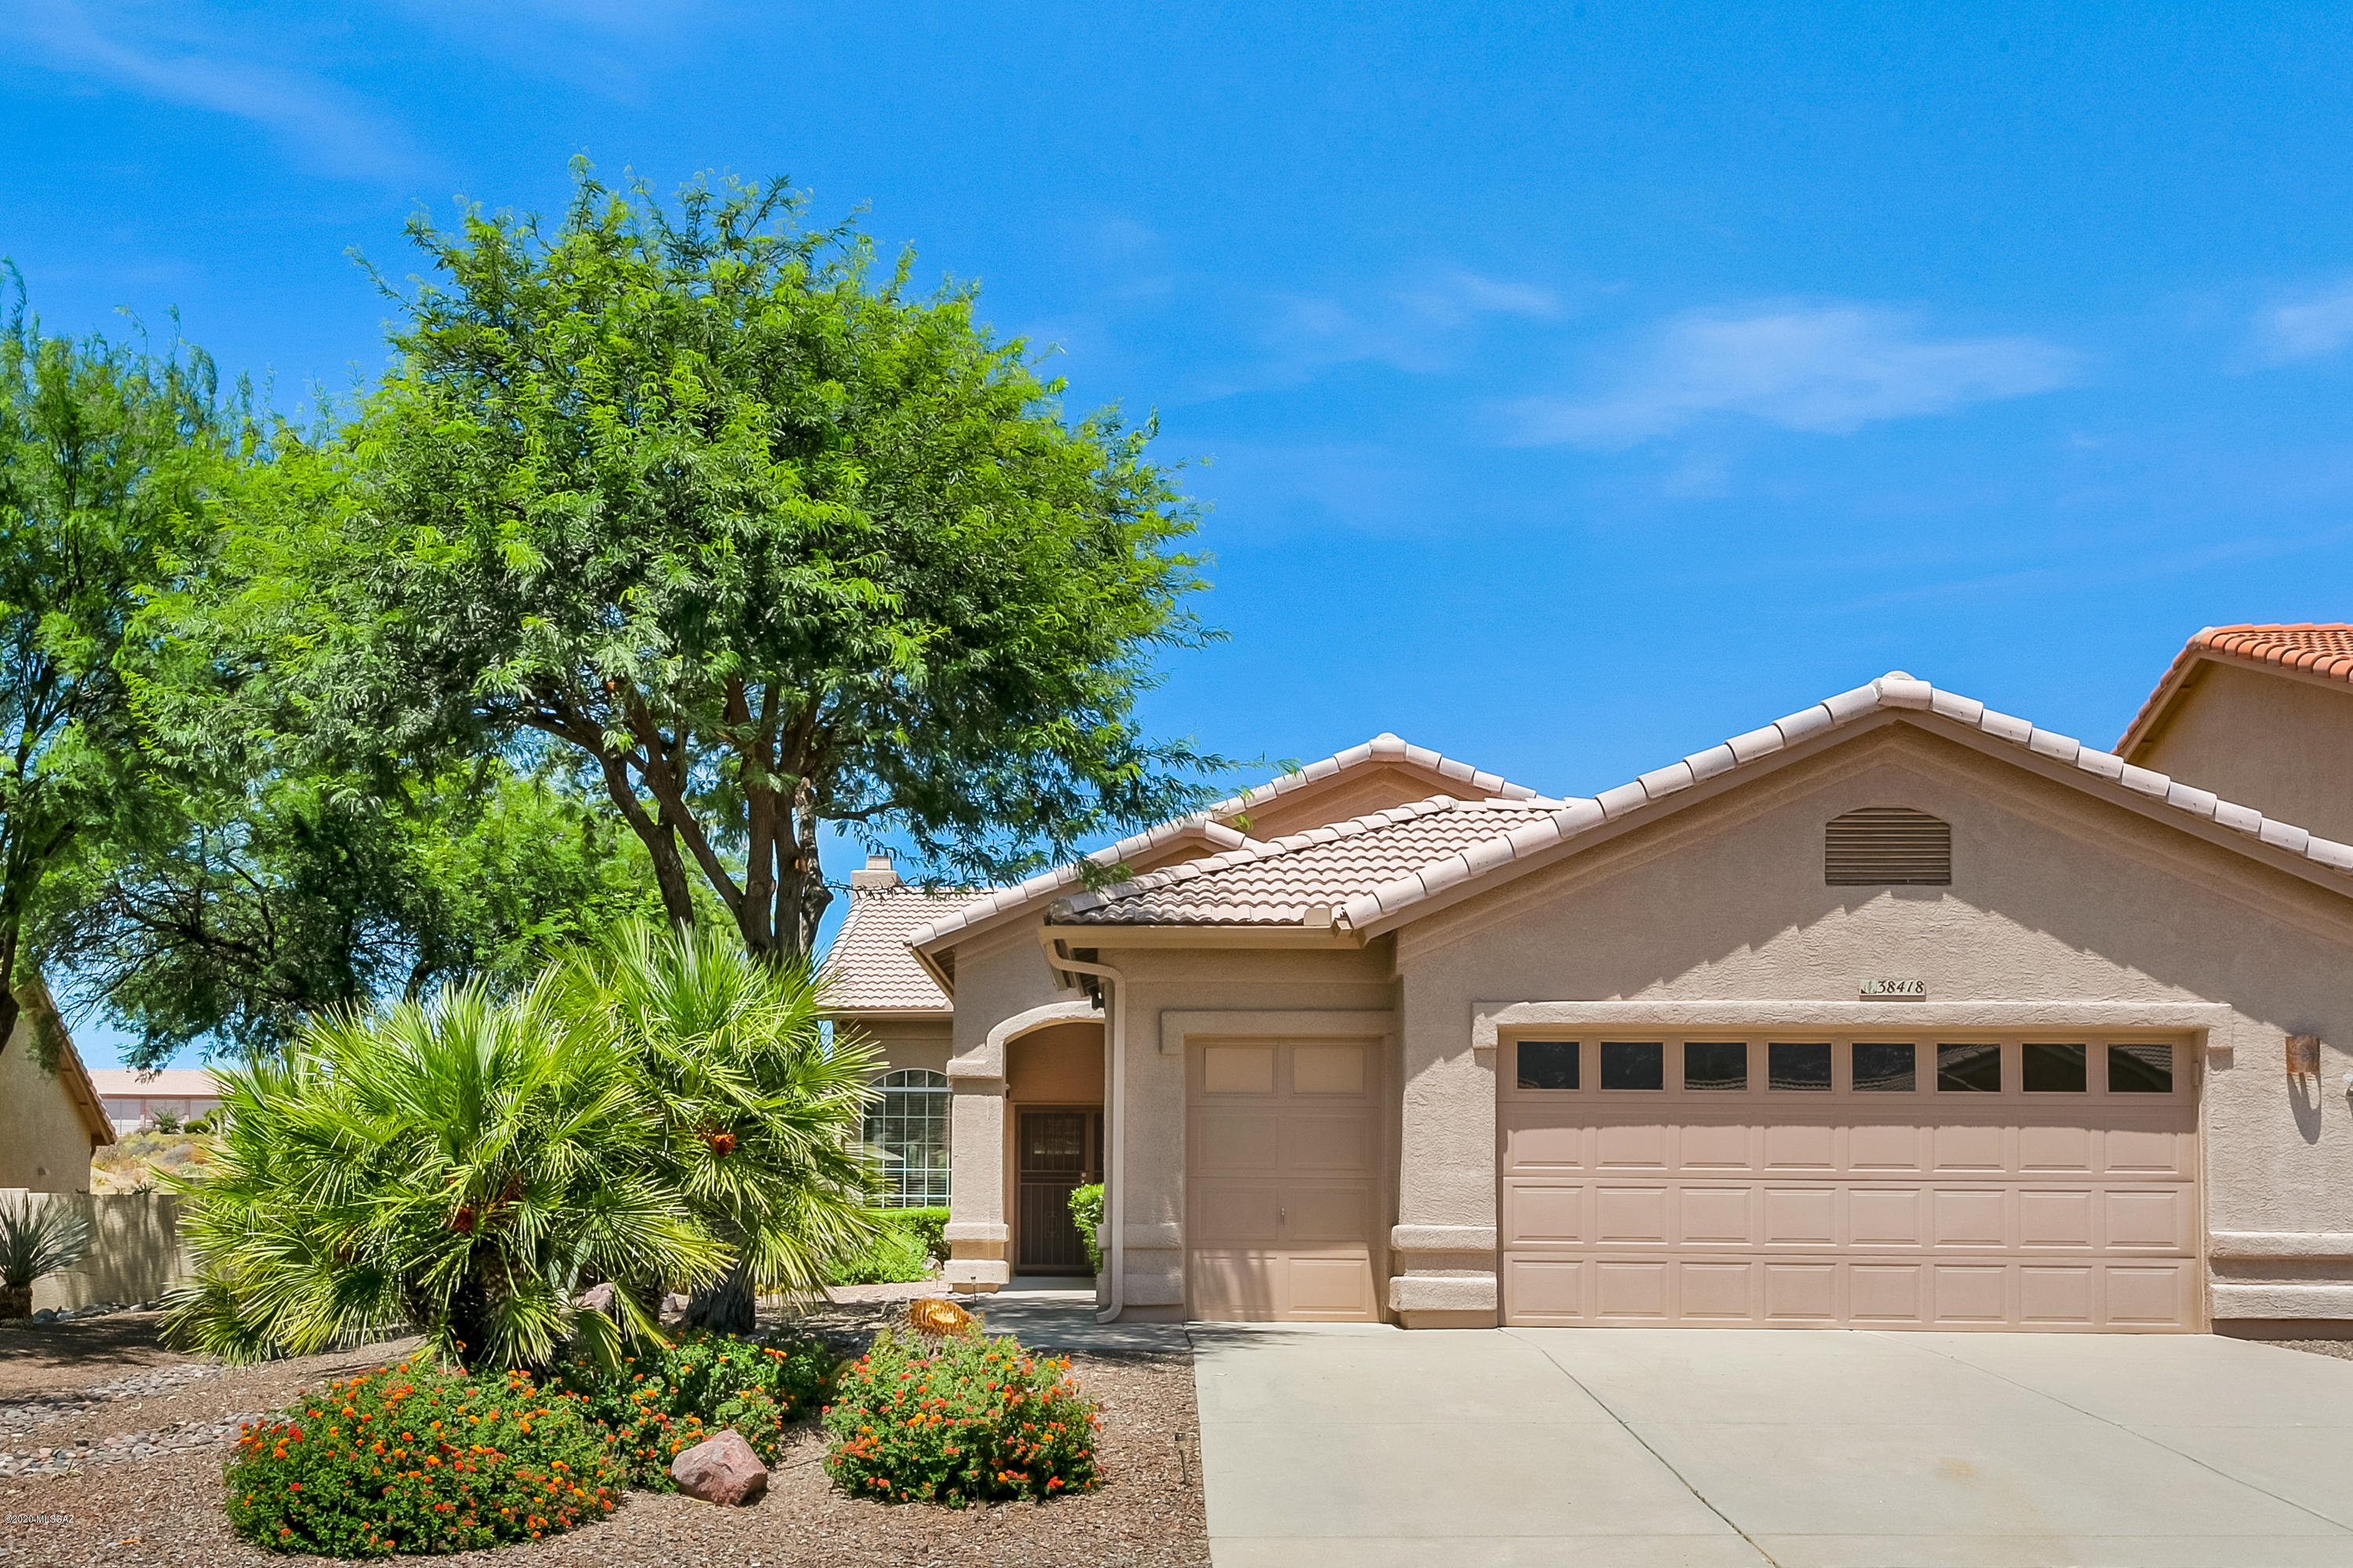 Photo of 38418 S Golf Course Drive, Tucson, AZ 85739